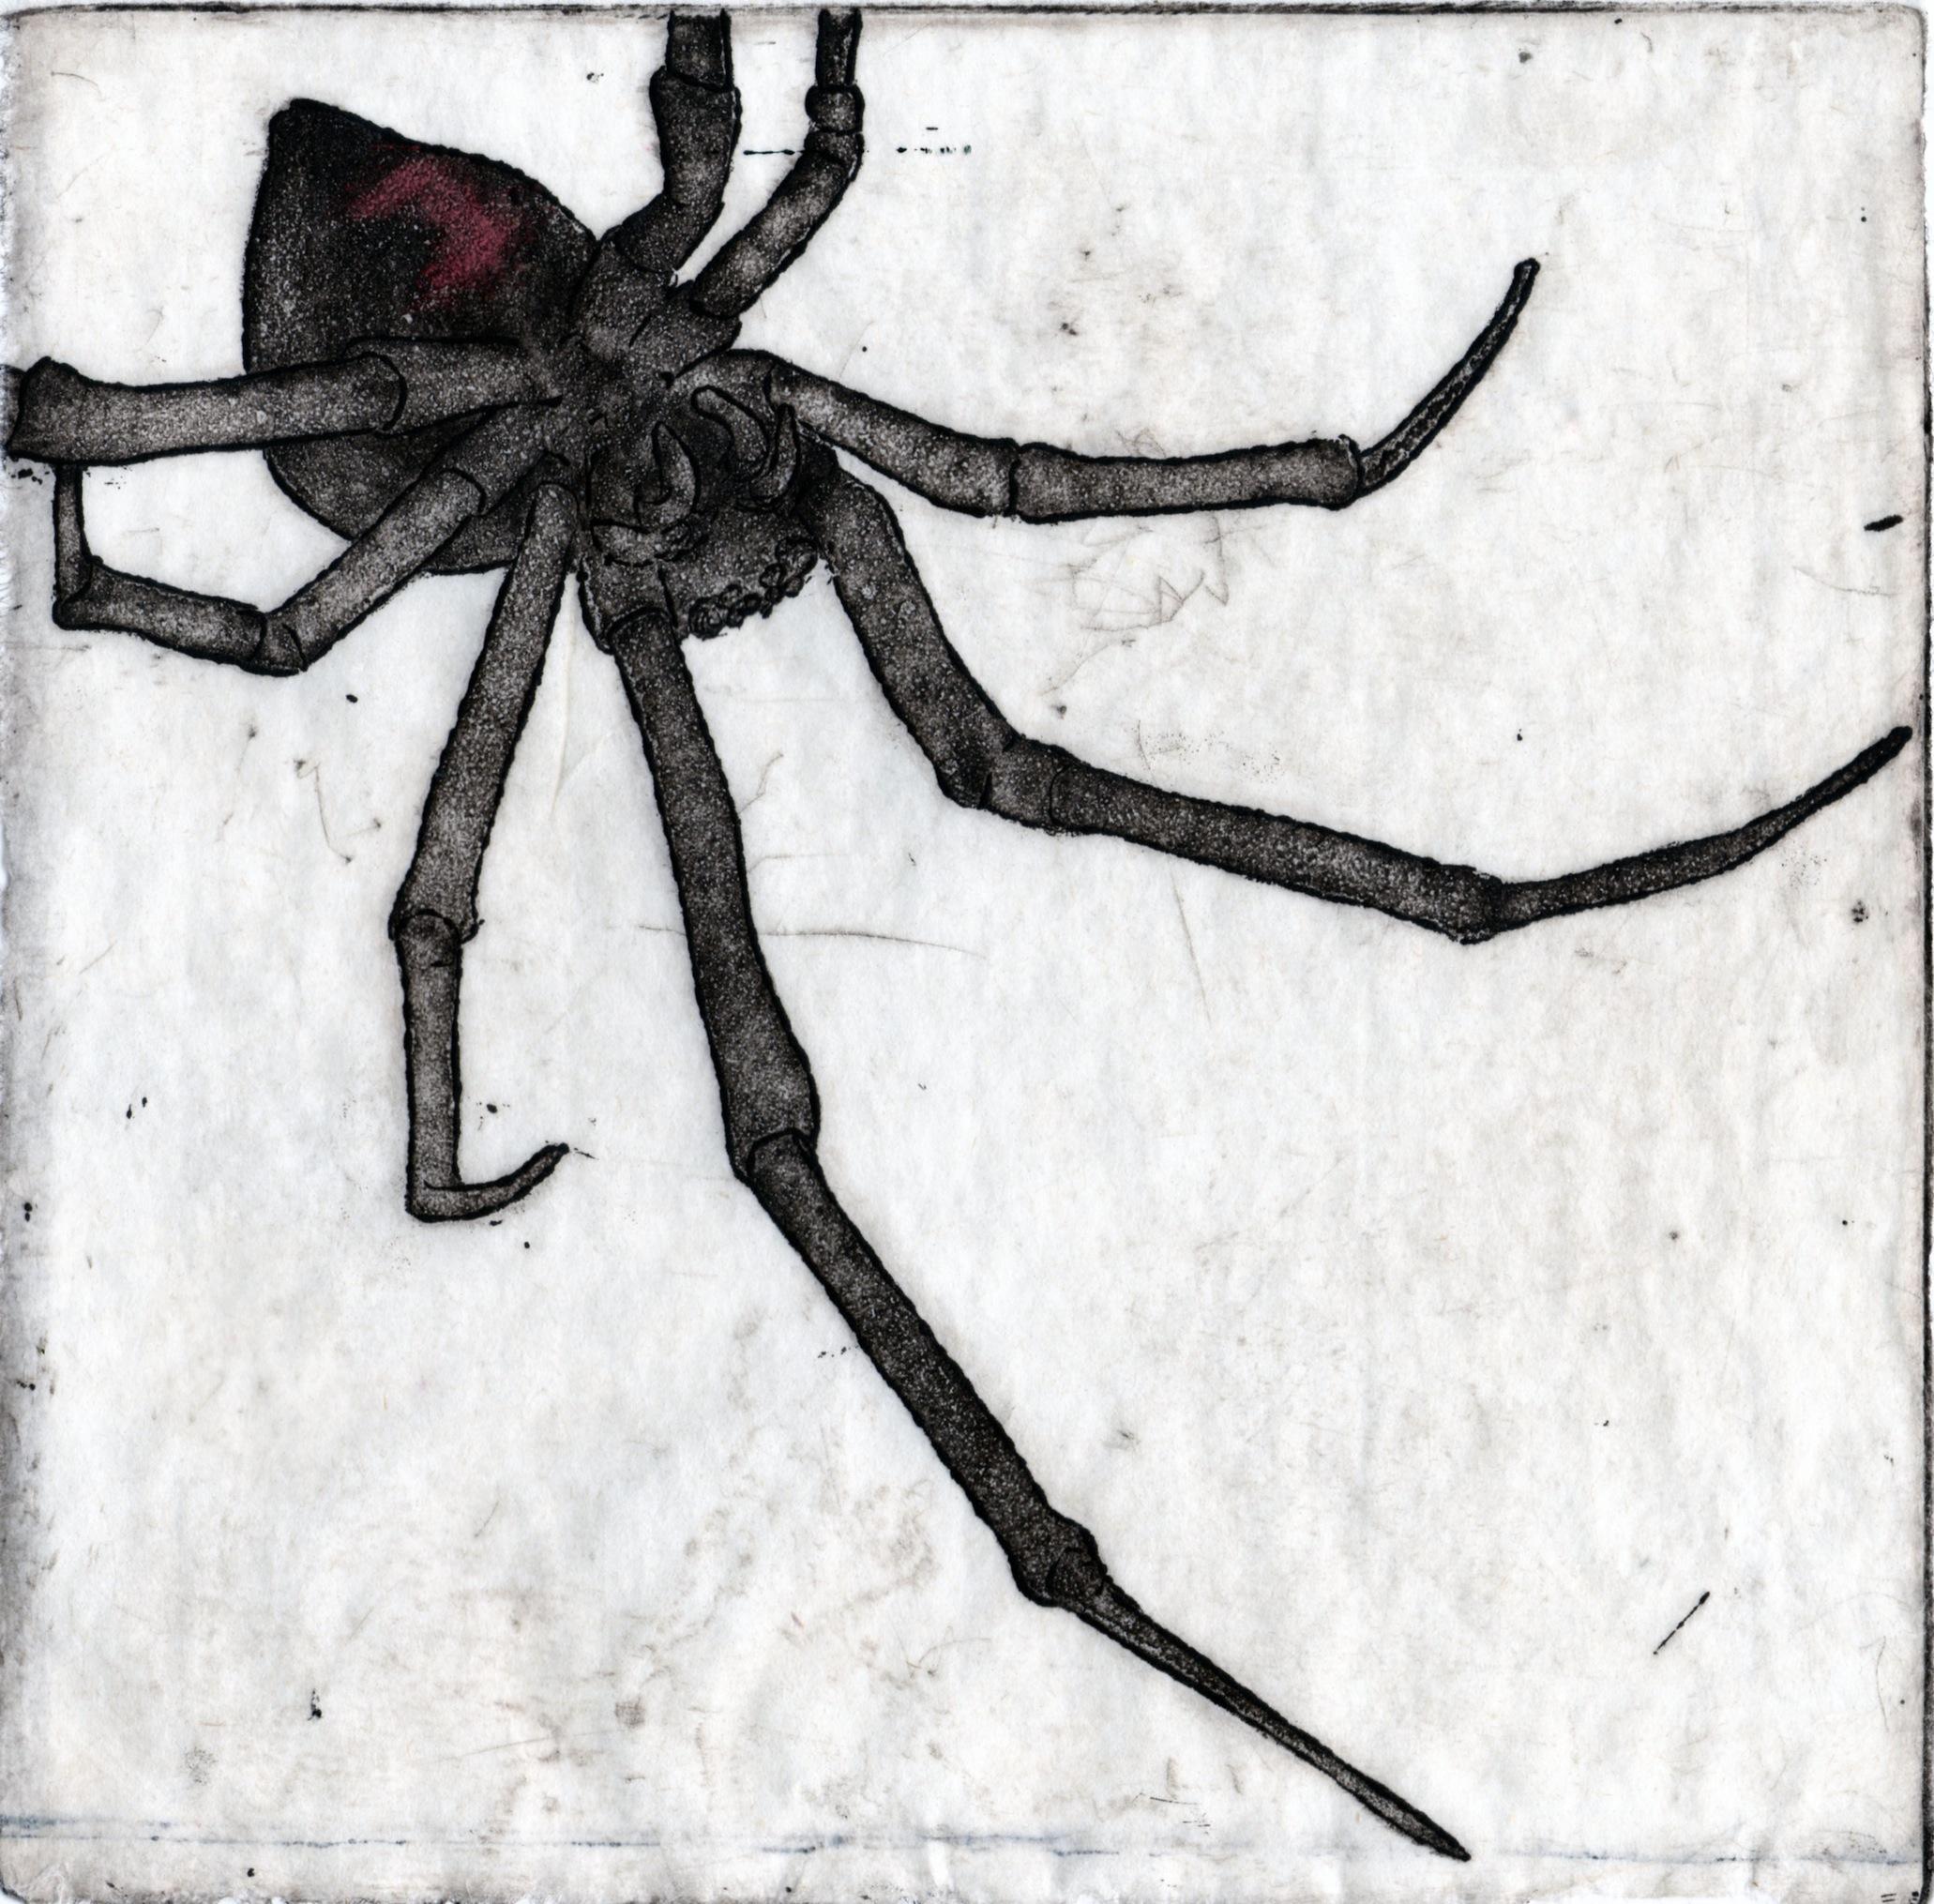 Pest006.jpg